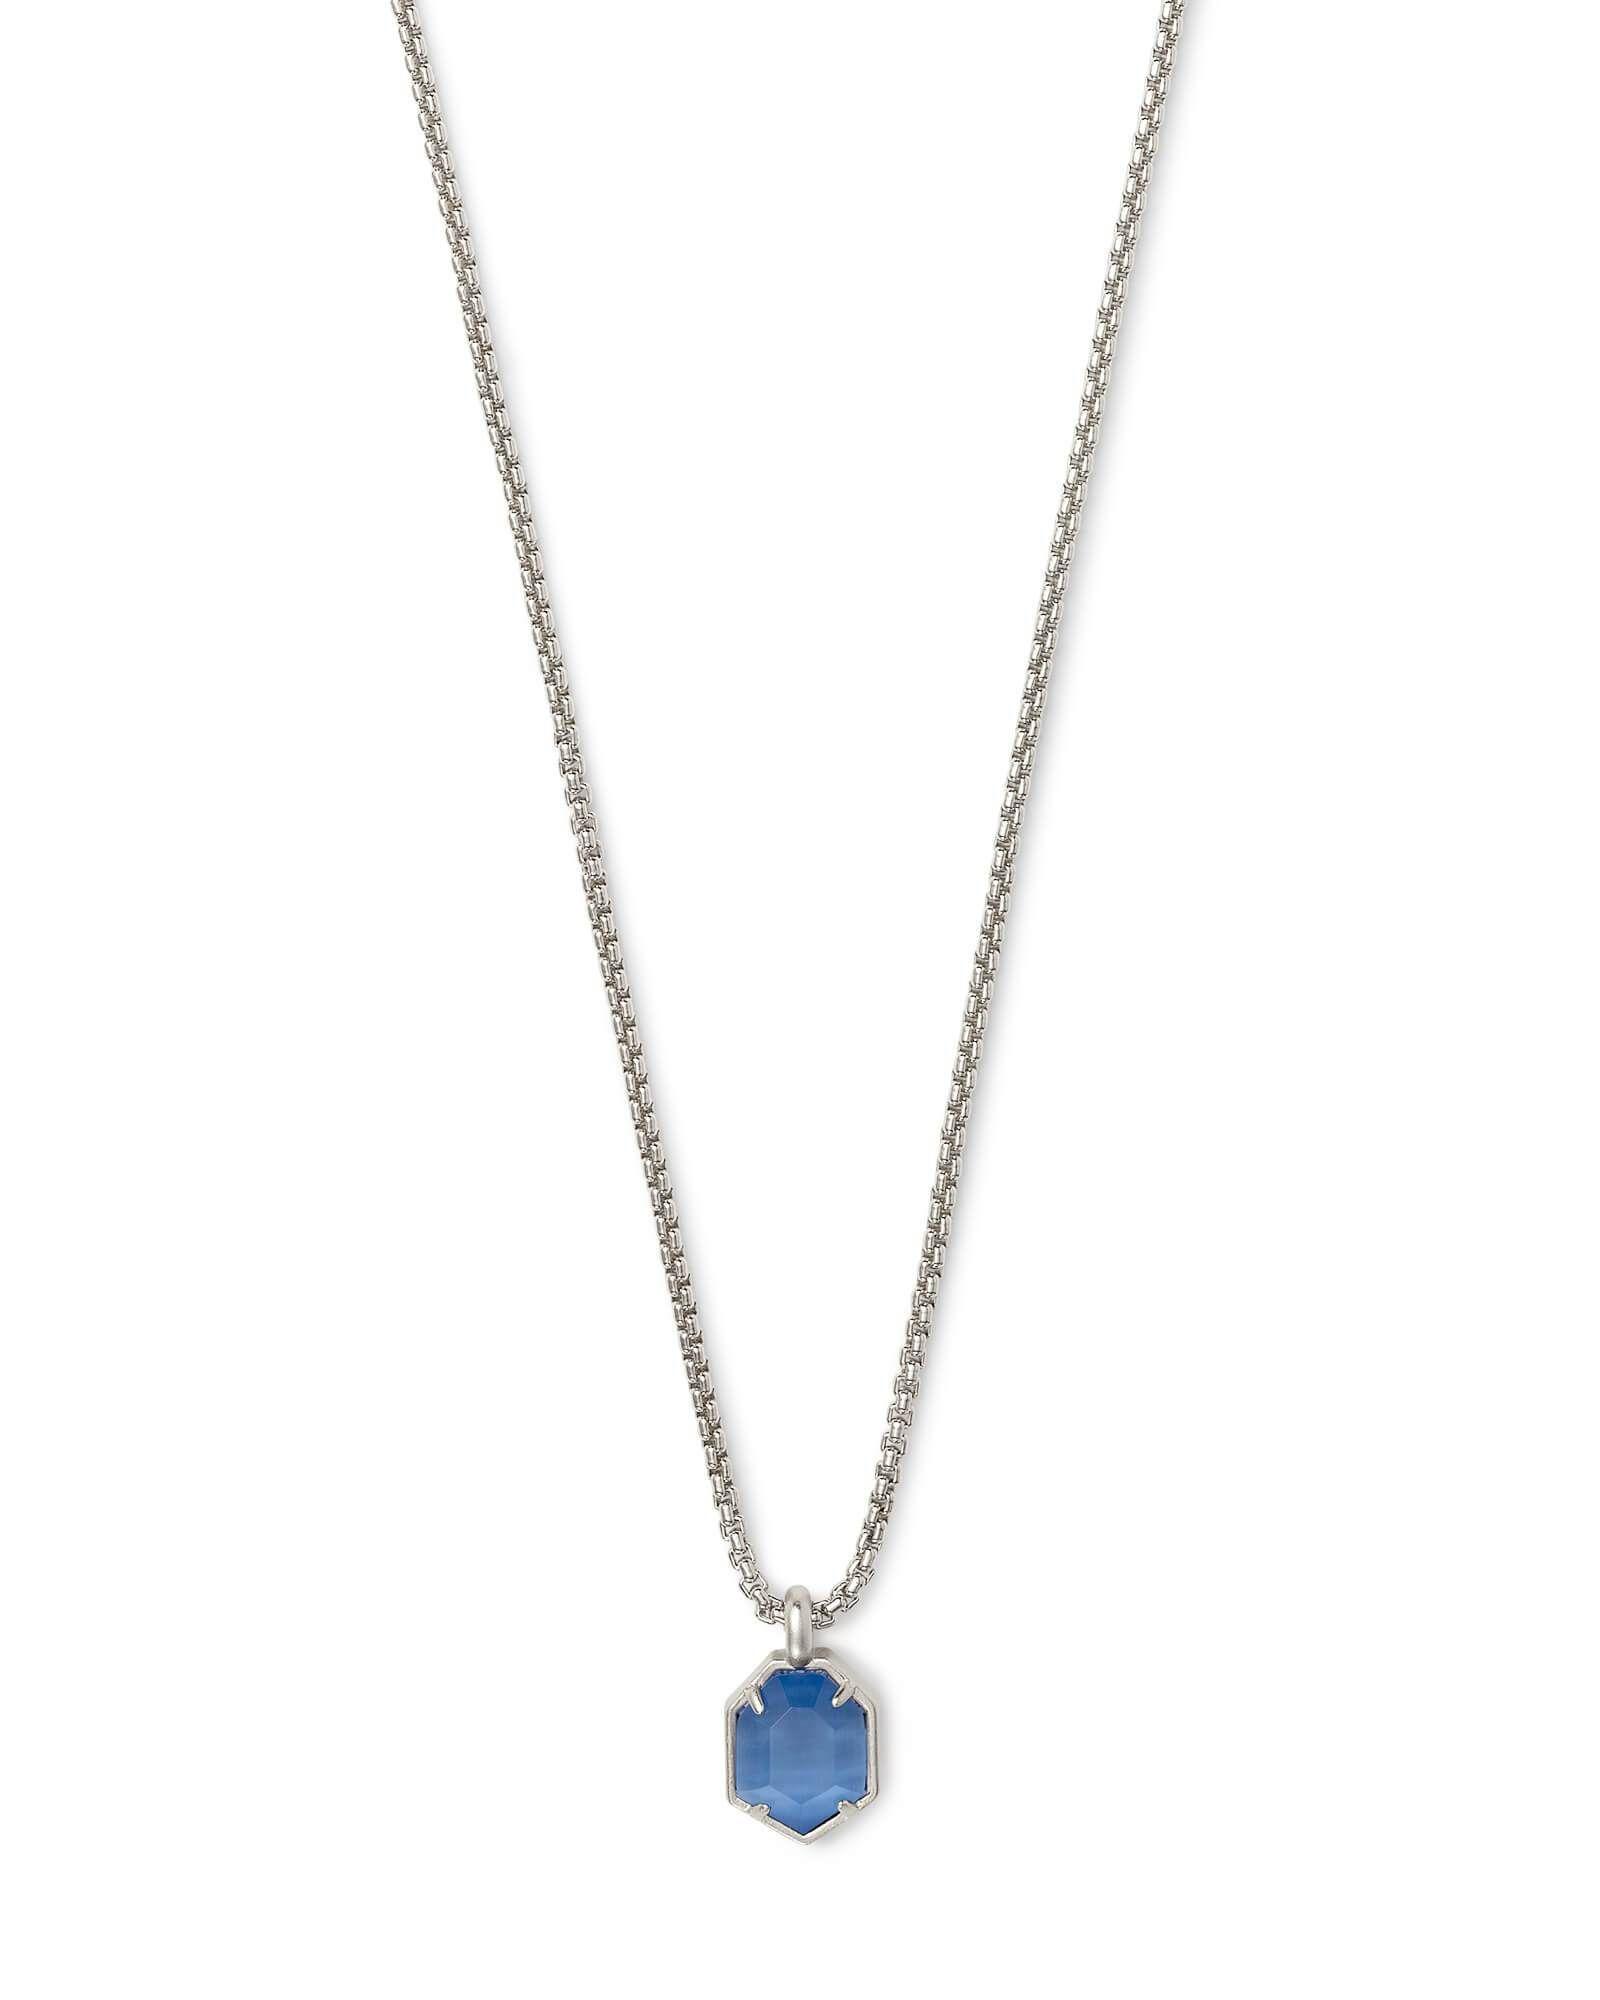 Kendra scott teo long silver necklace in periwinkle pinterest